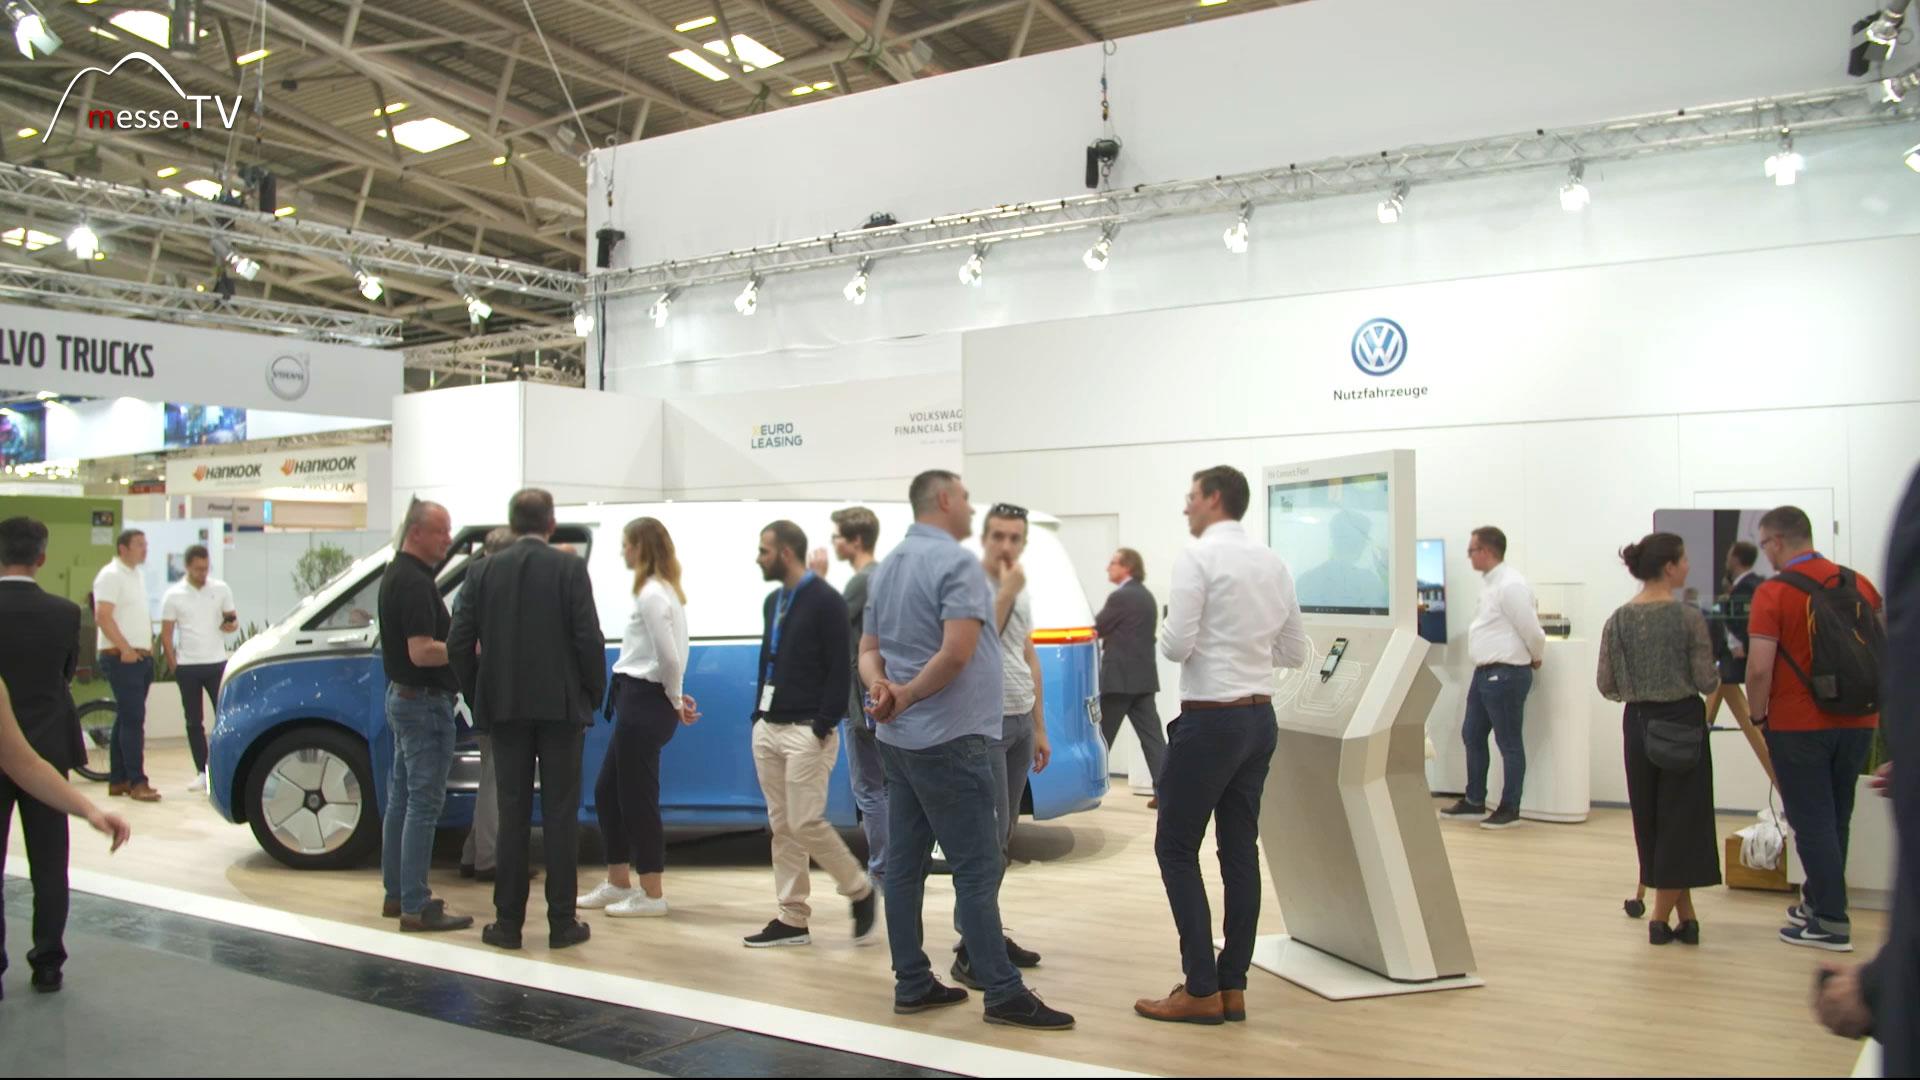 VW Nutzfahrzeuge Messestand transport logistic 2019 Messe München